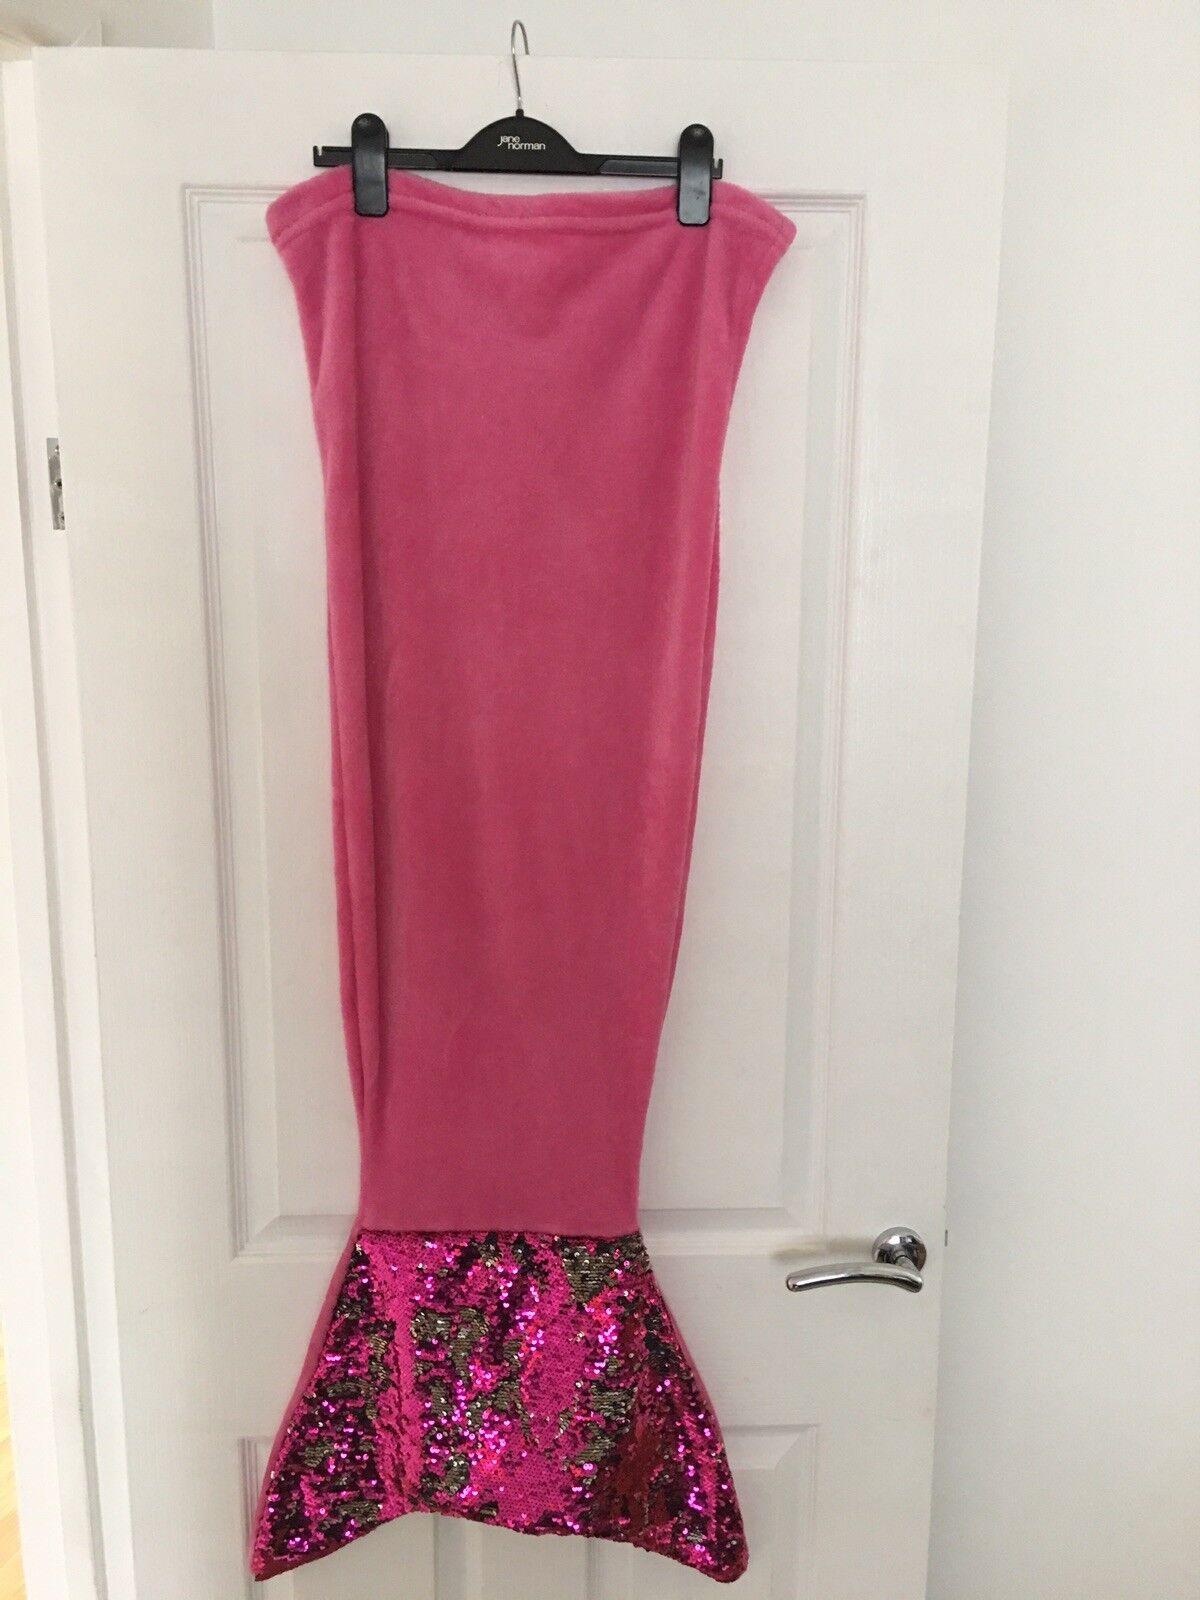 Stunning mermaid tail blanet pink sequin